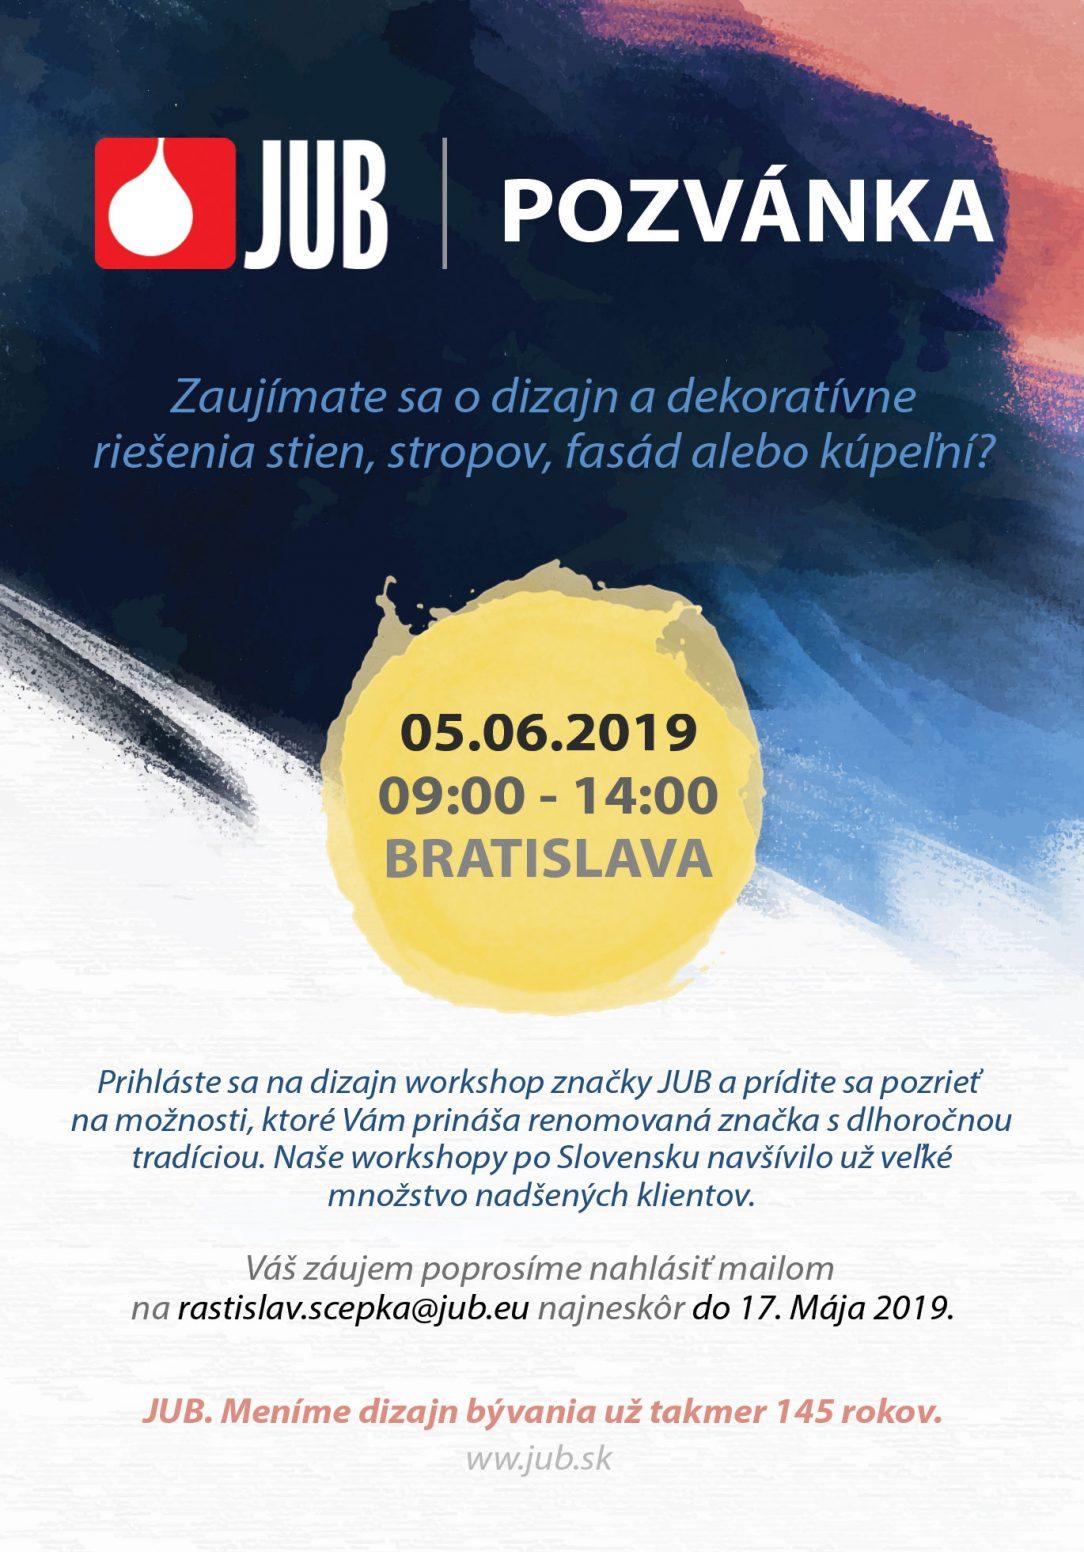 Pozvanka JUB decor ARCH 05.06.2019